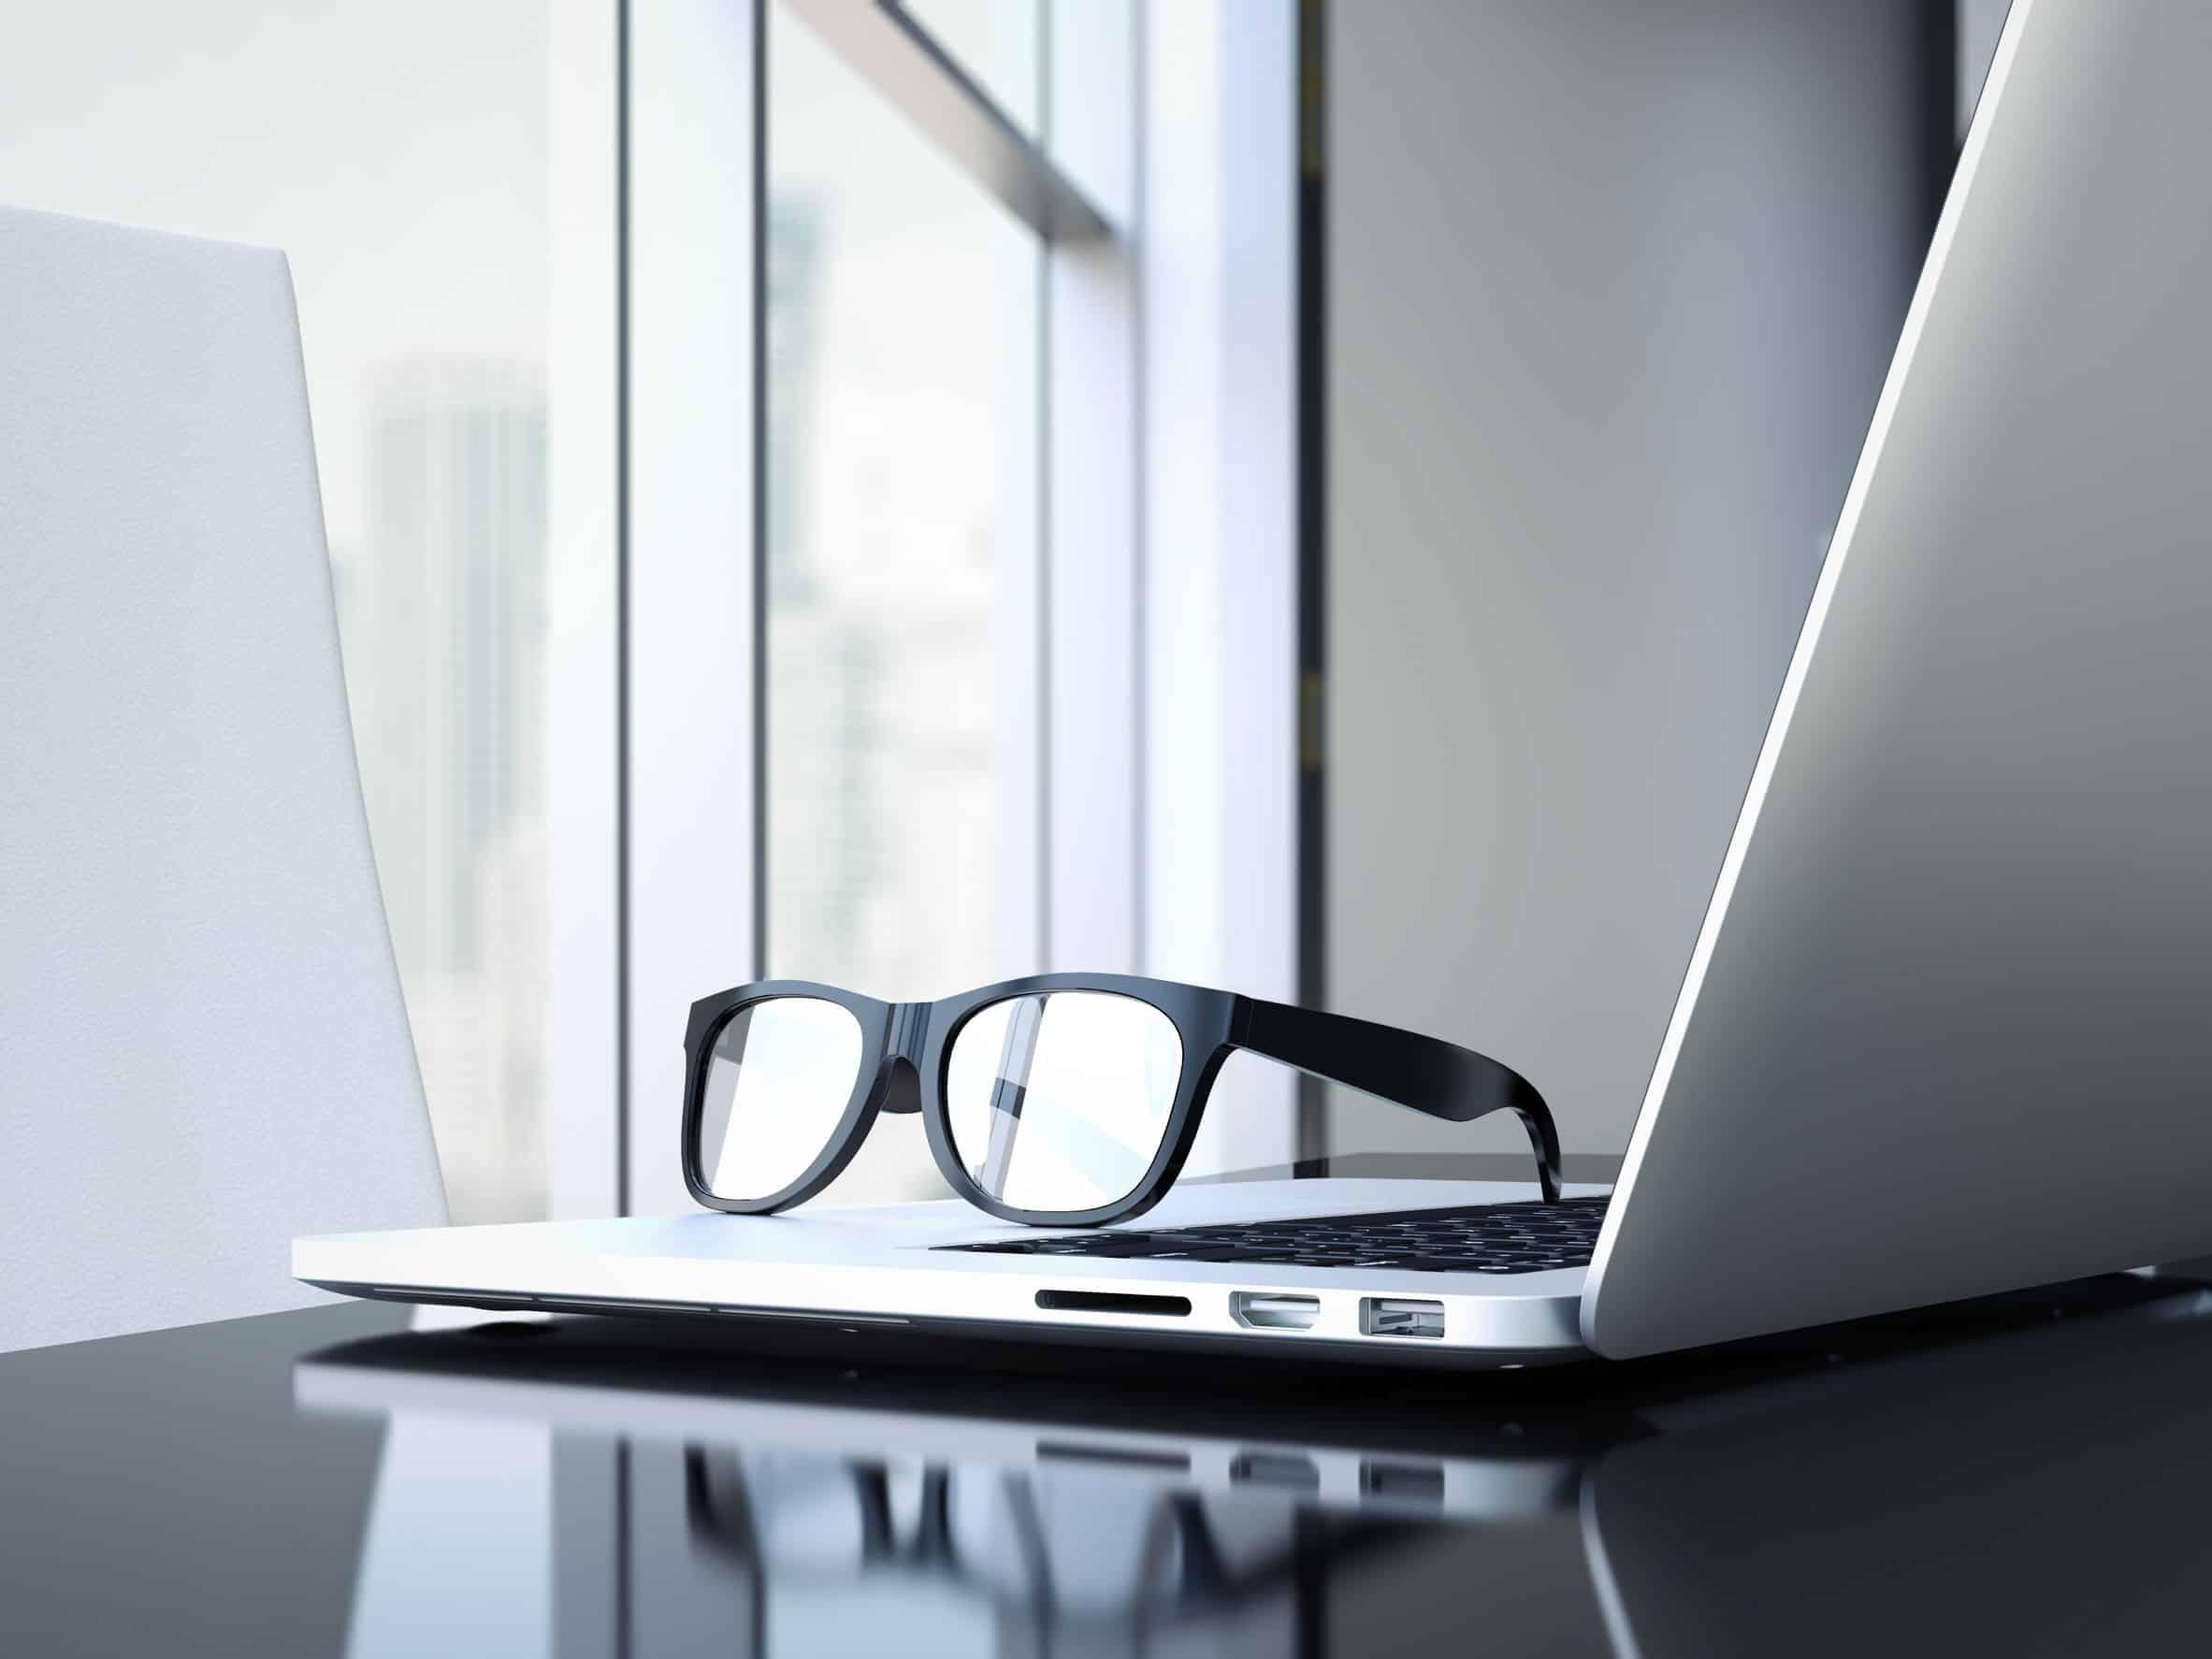 bril op de computer